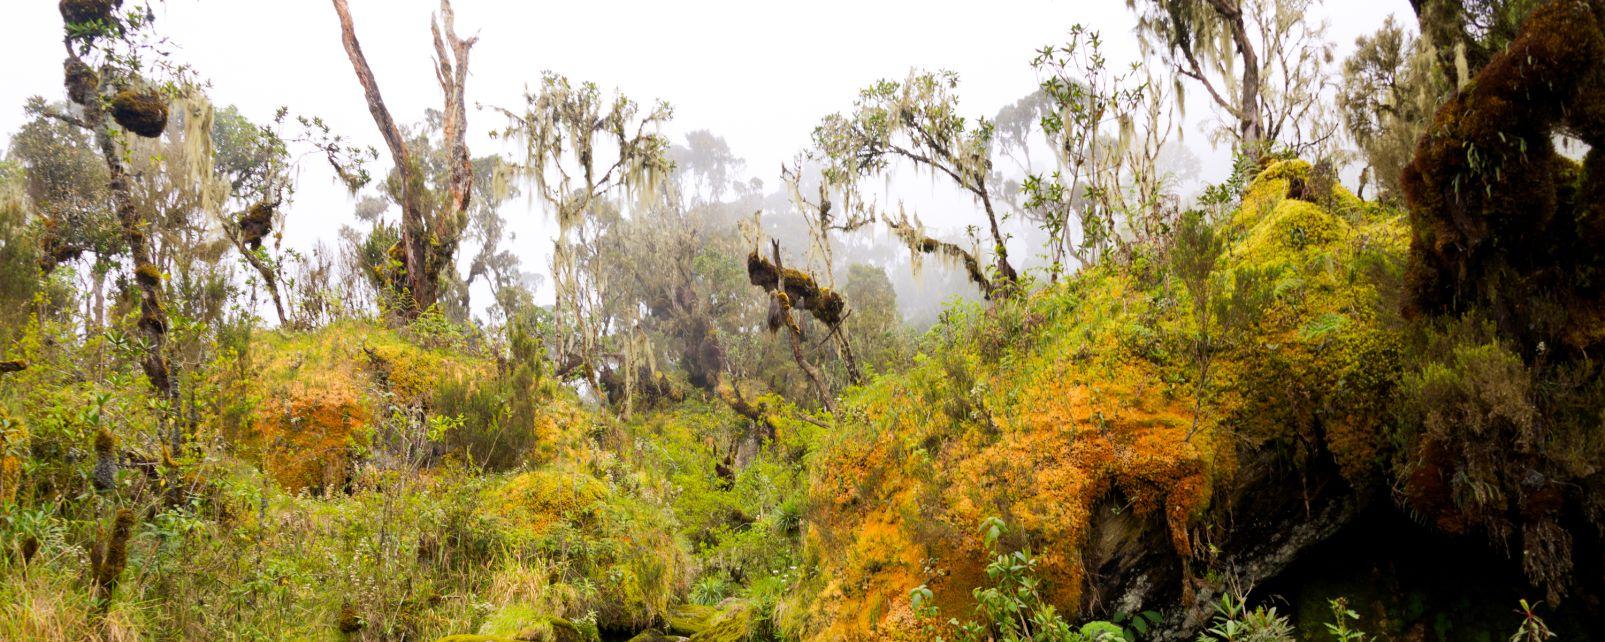 Le montagne del Ruwenzori, I paesaggi, Uganda